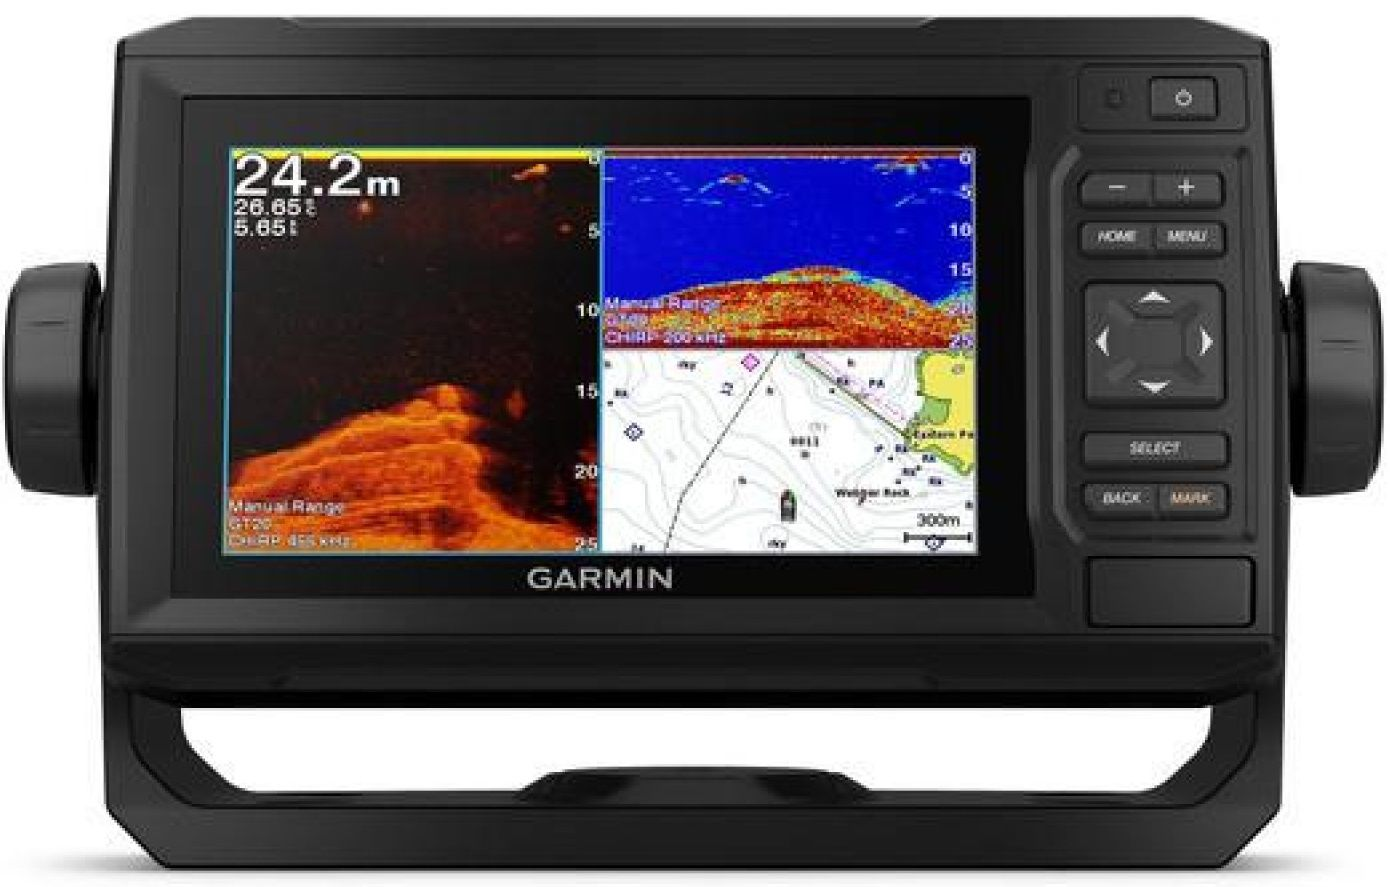 Gps Sonar Garmin Echomap 62CV Plus Transdutor CV20-TM 4 pinos 010-01888-01